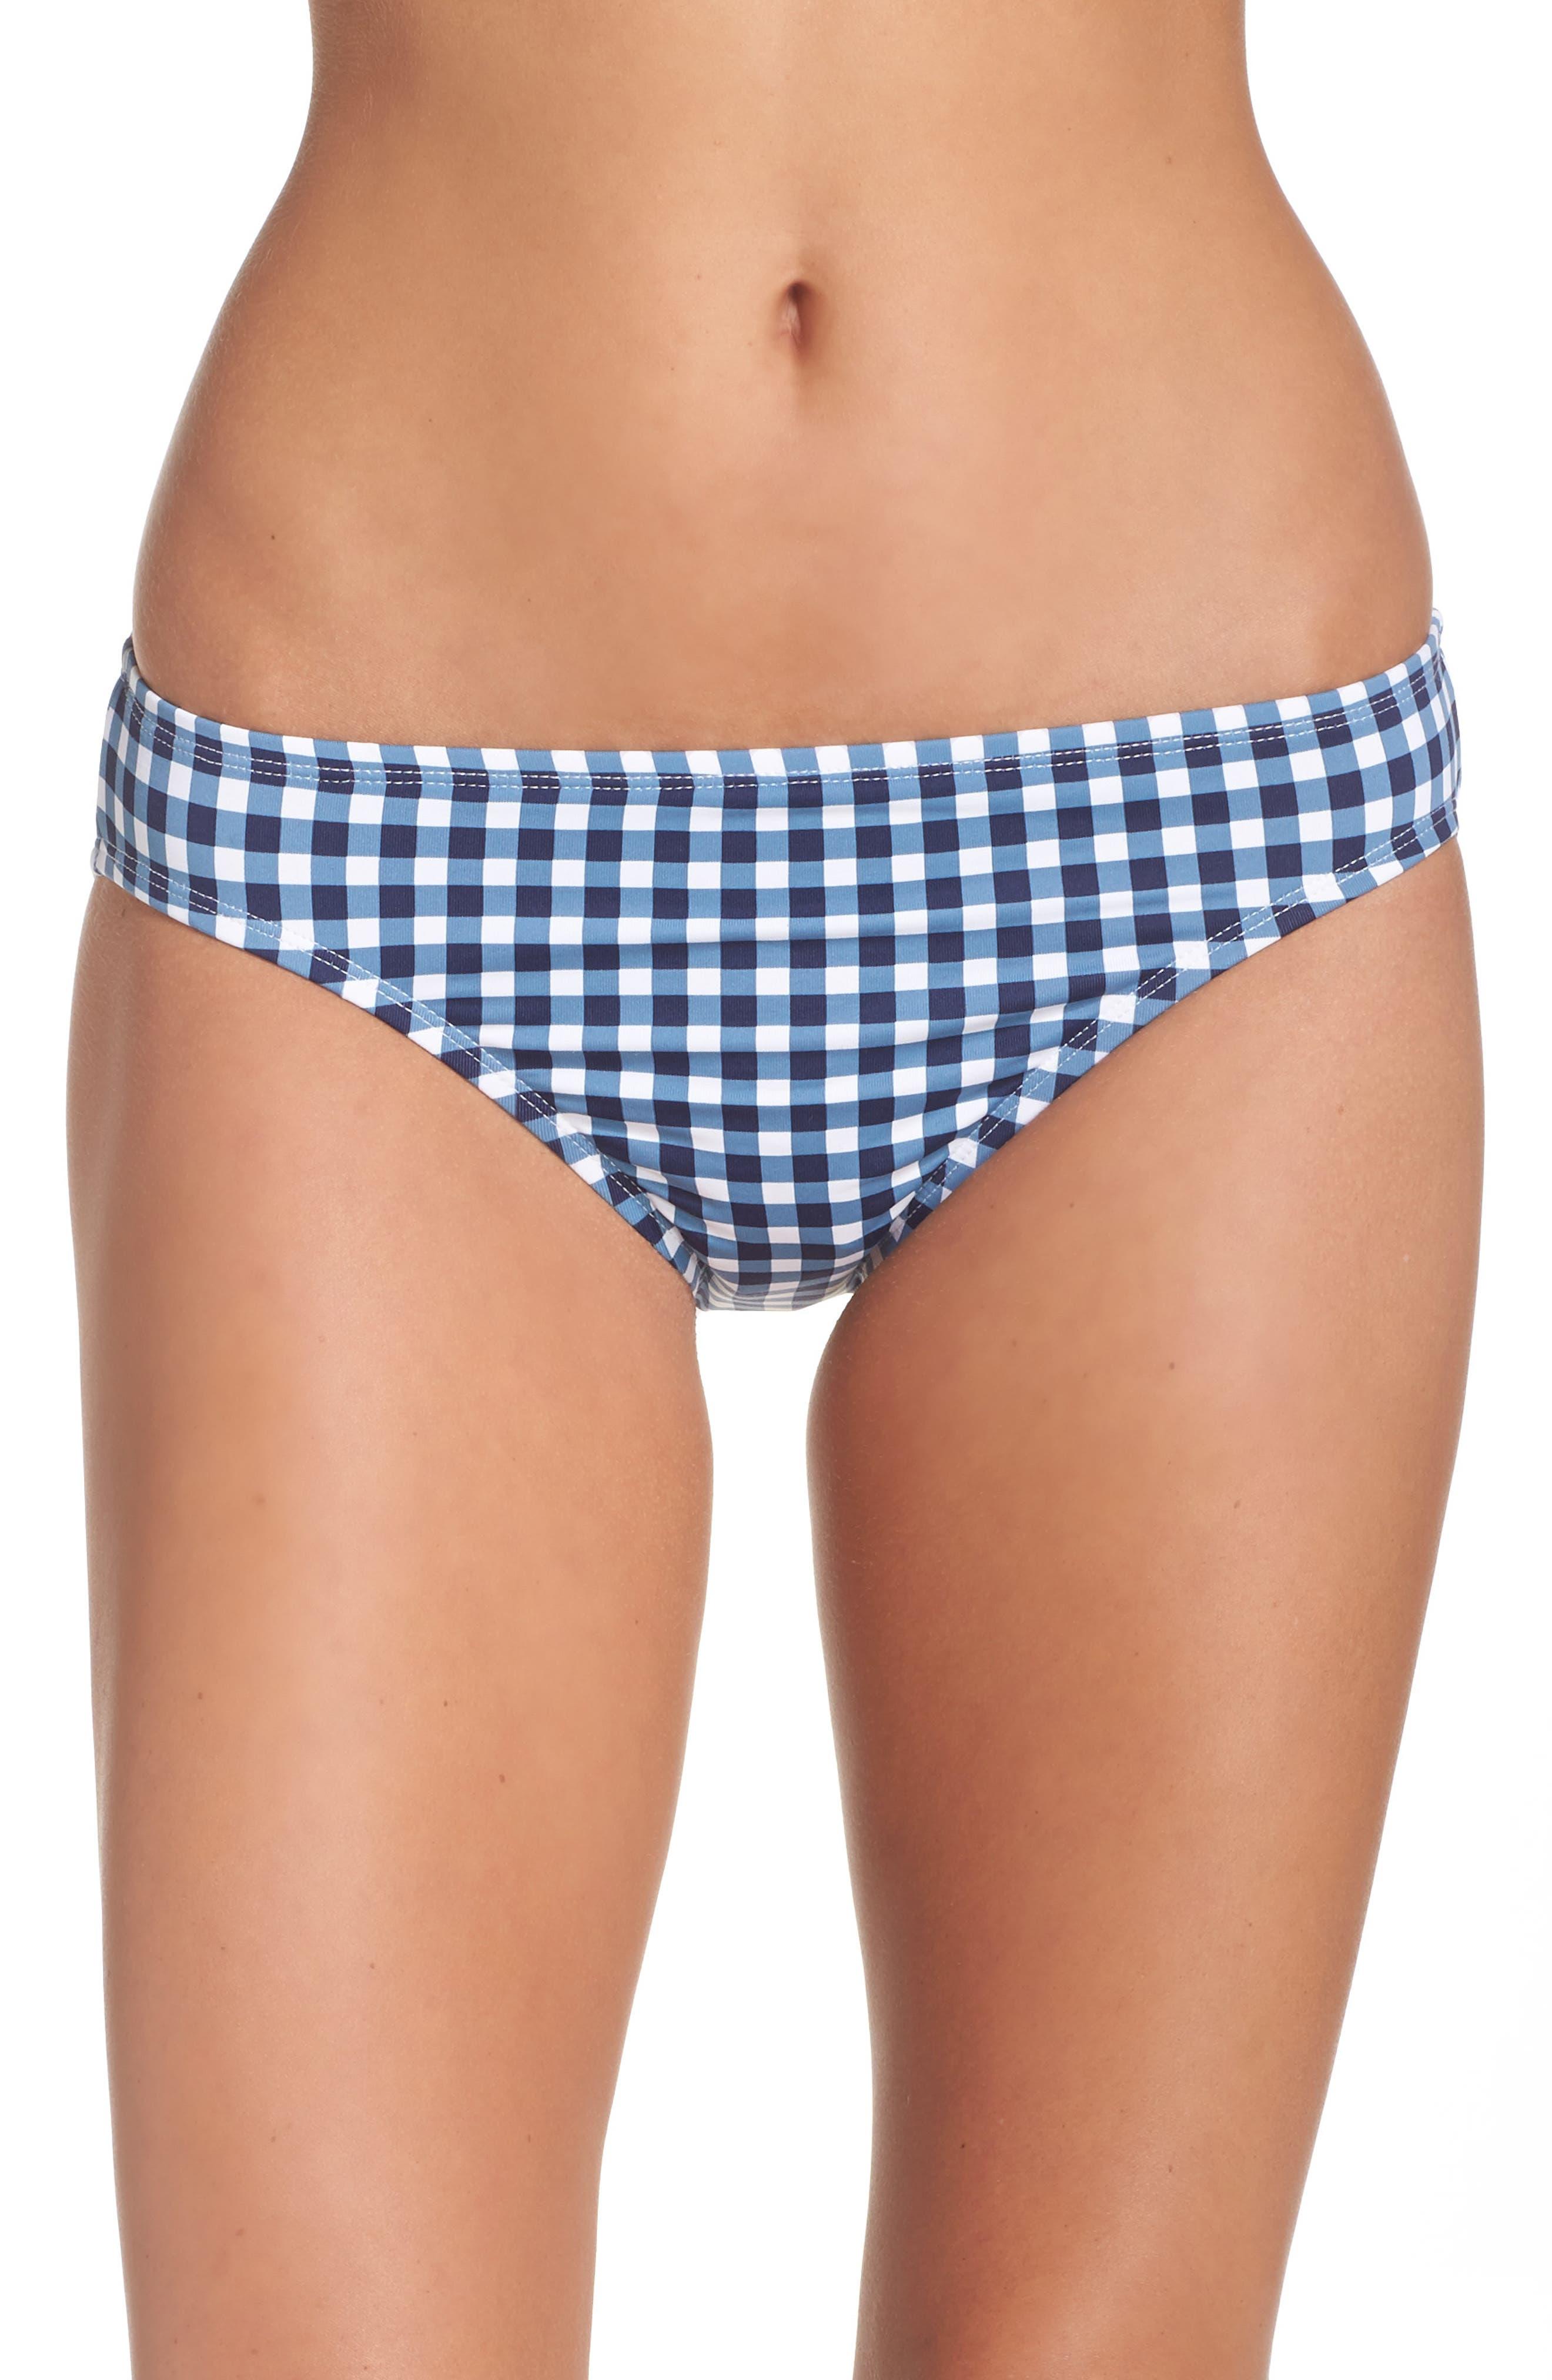 Alternate Image 1 Selected - Tommy Bahama Gingham Bikini Bottoms